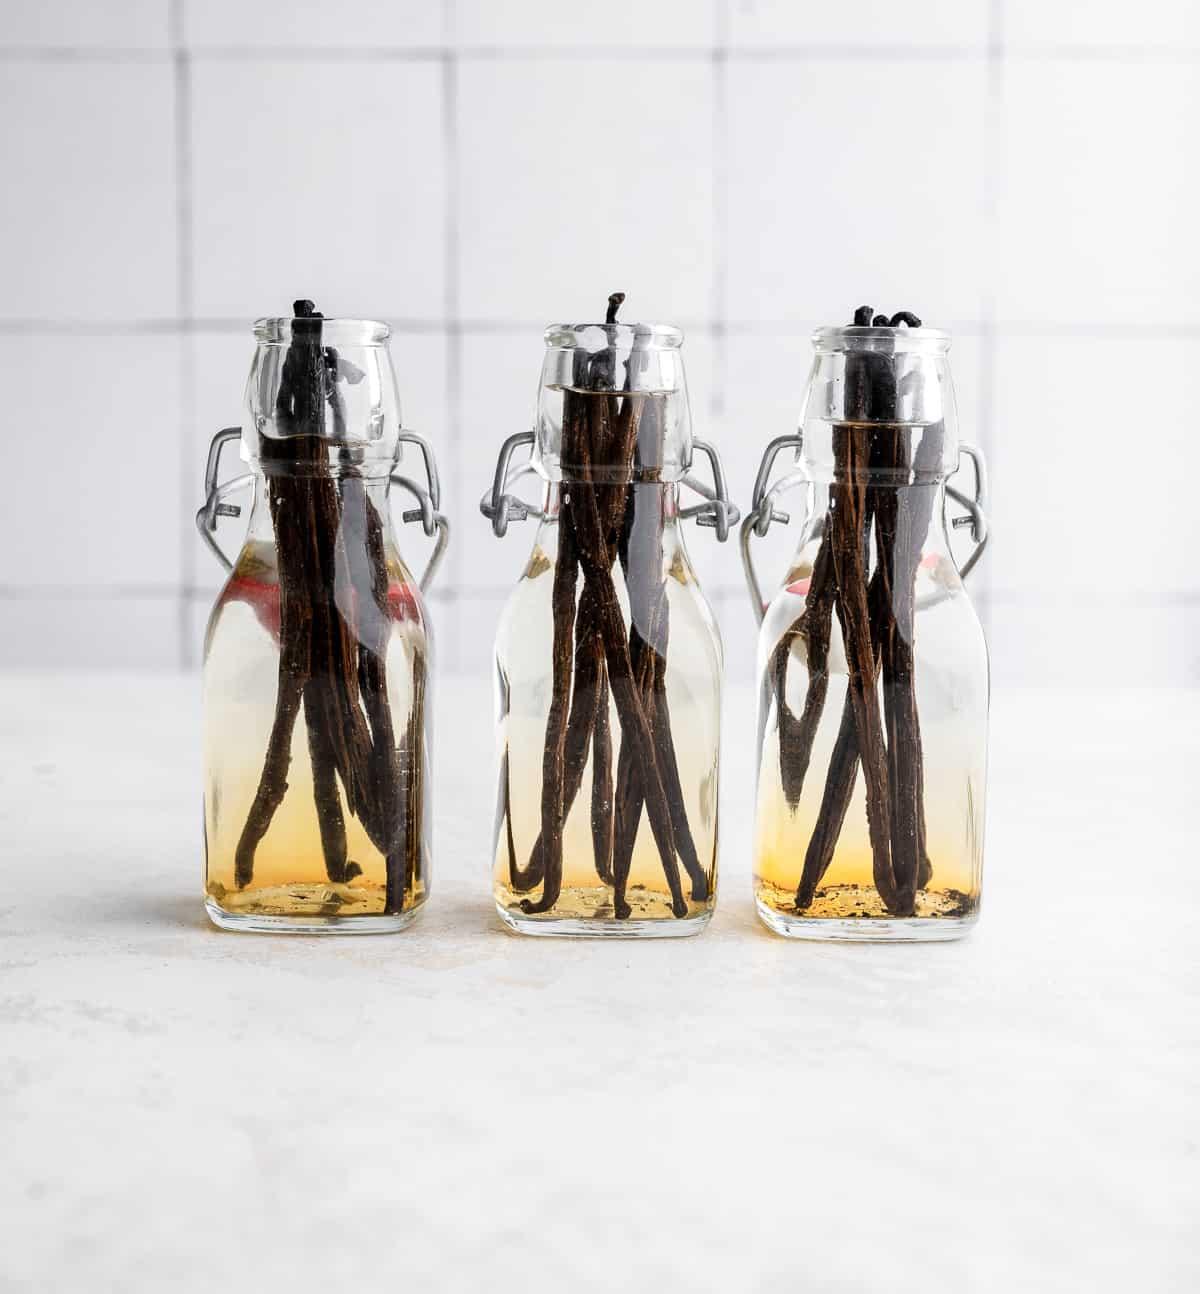 vanilla extract in a jar